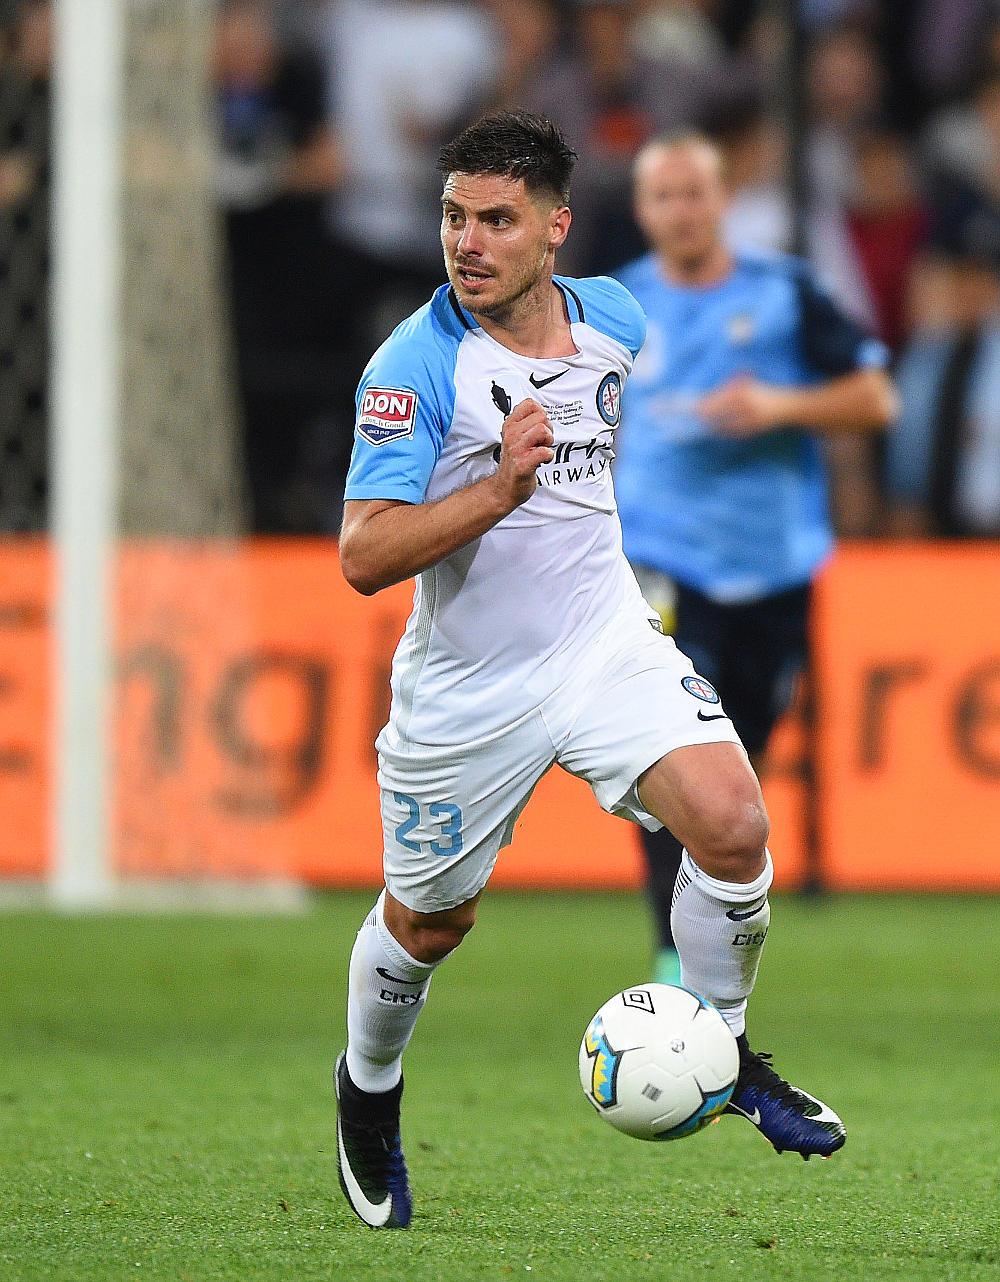 Brun Fornaroli dribbles the ball